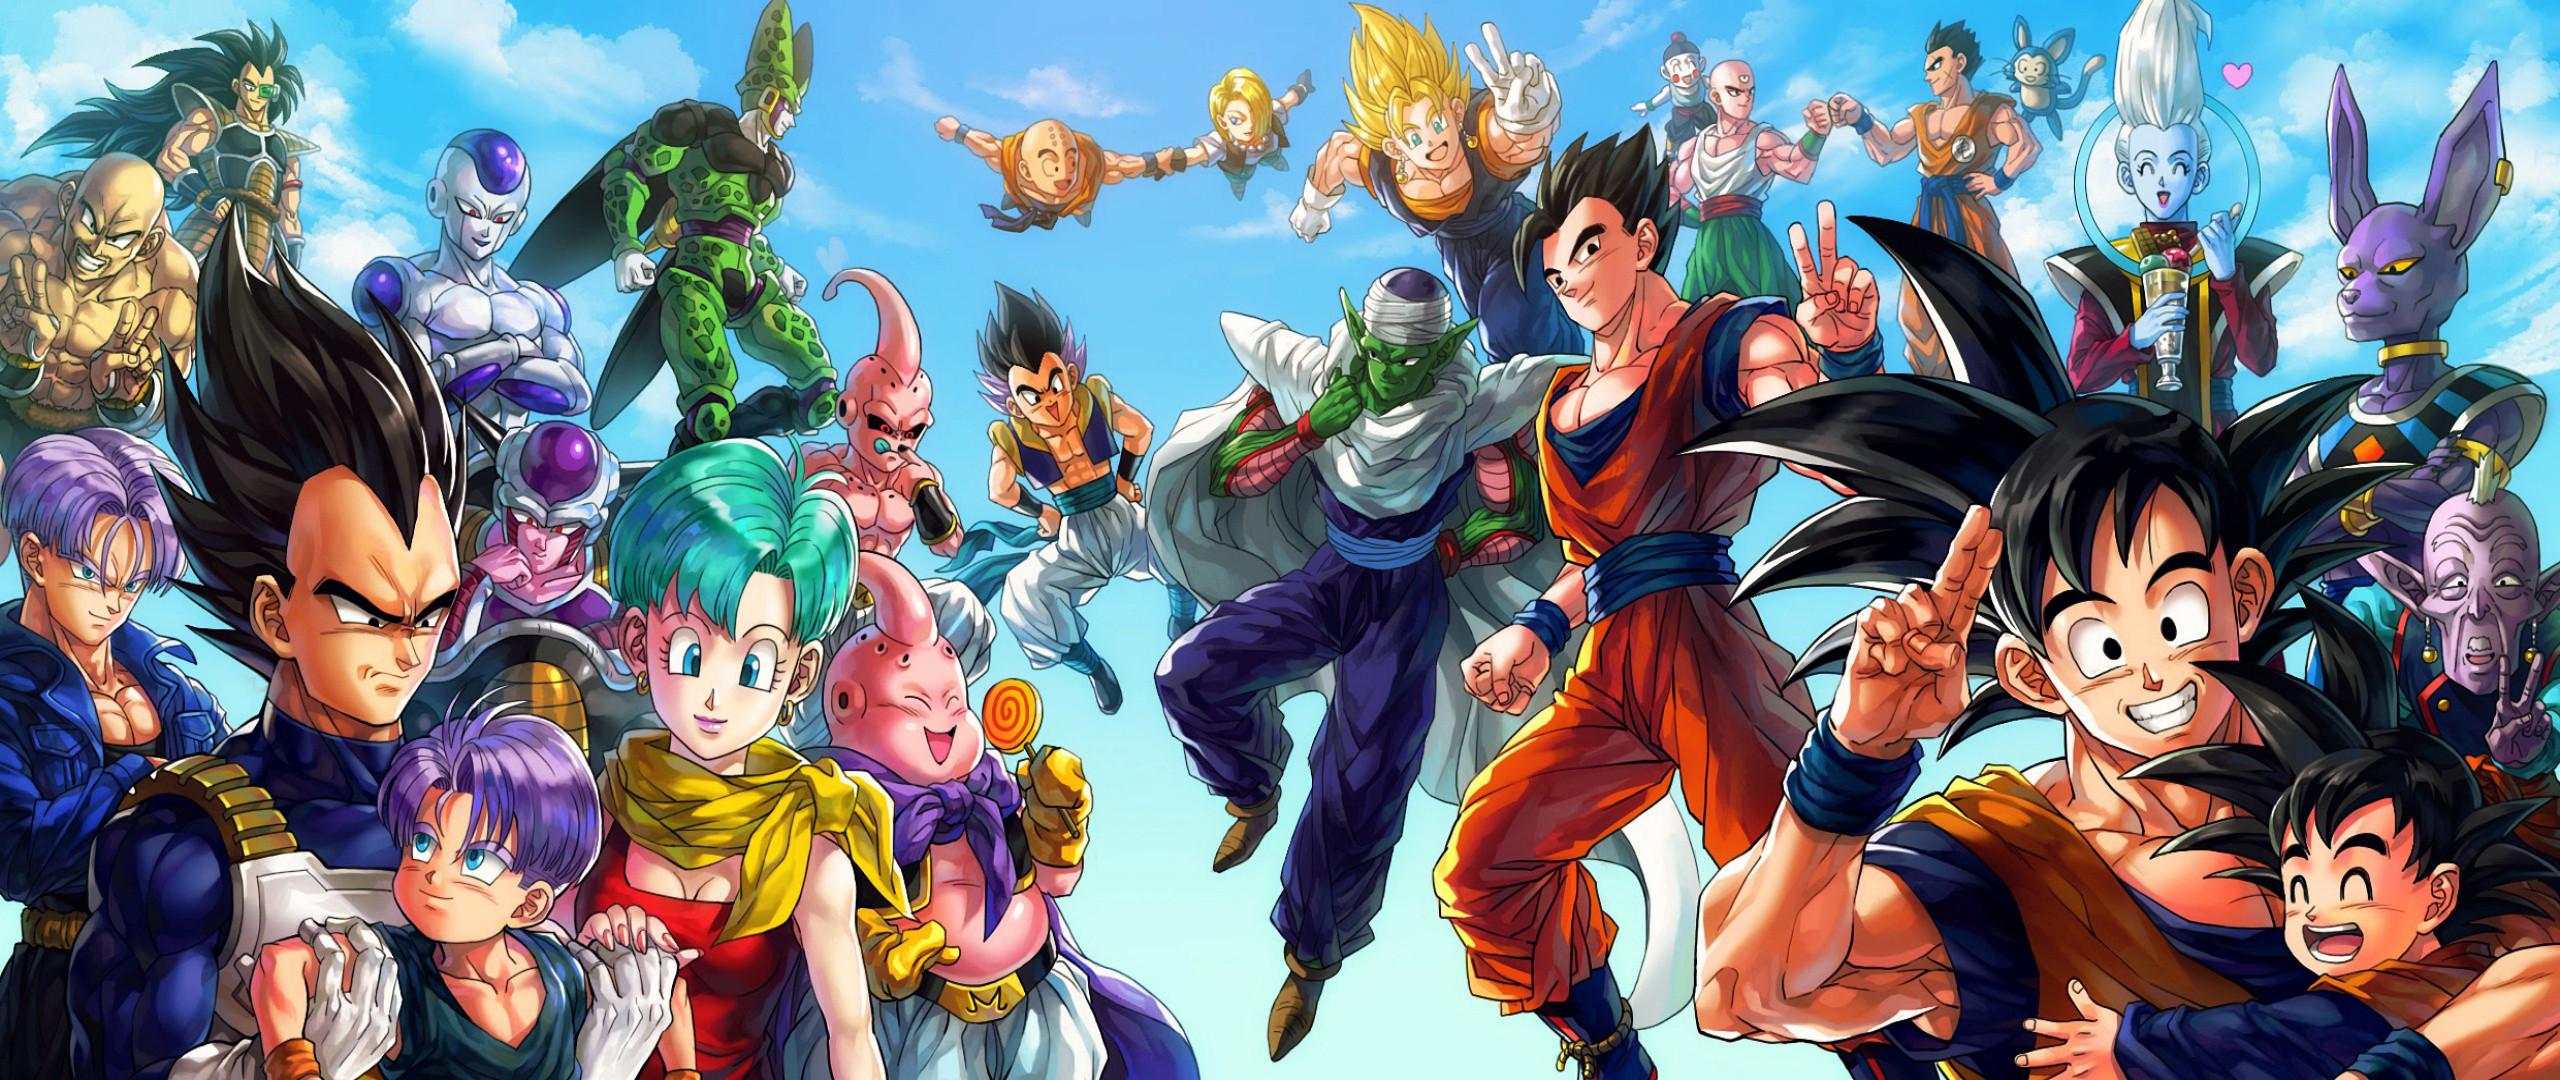 Cell Dragon Ball Z Freeza Gohan Goku Piccolo Raditz Trunks Vegeta · HD  Wallpaper   Background ID:647552